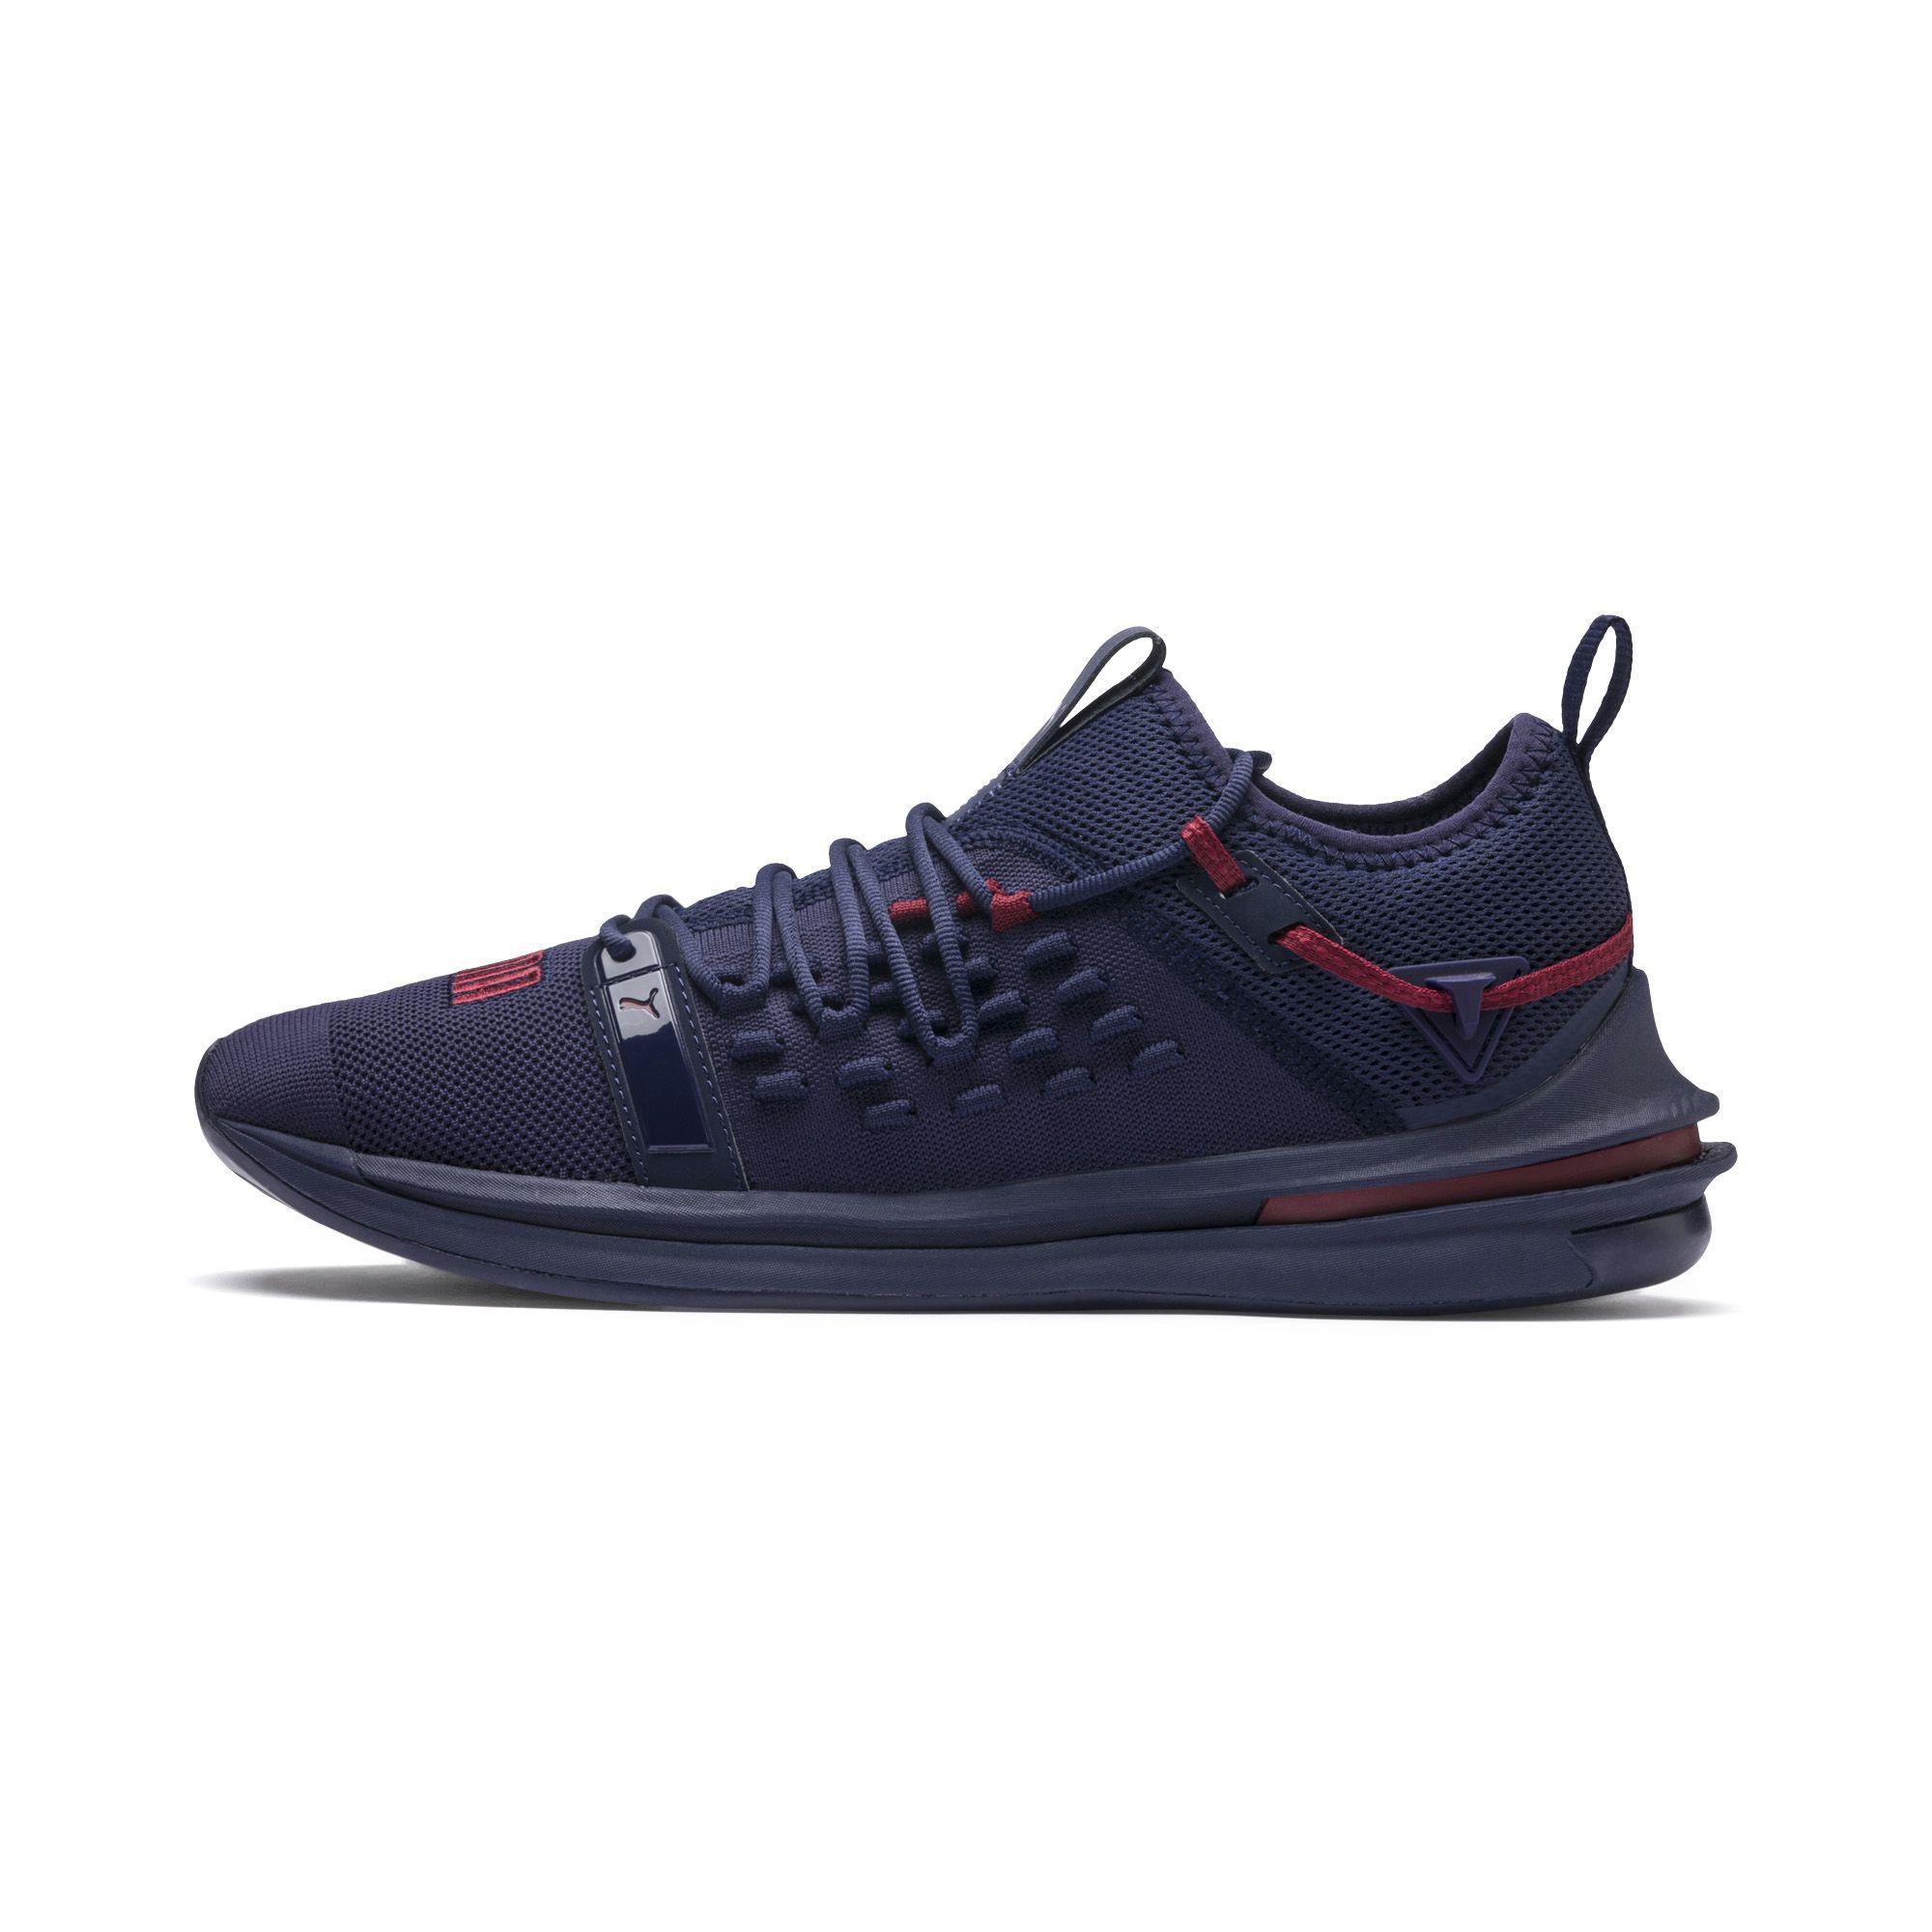 Lyst - PUMA Ignite Limitless Sr Fusefit Running Shoes in Blue for Men 869e4de95